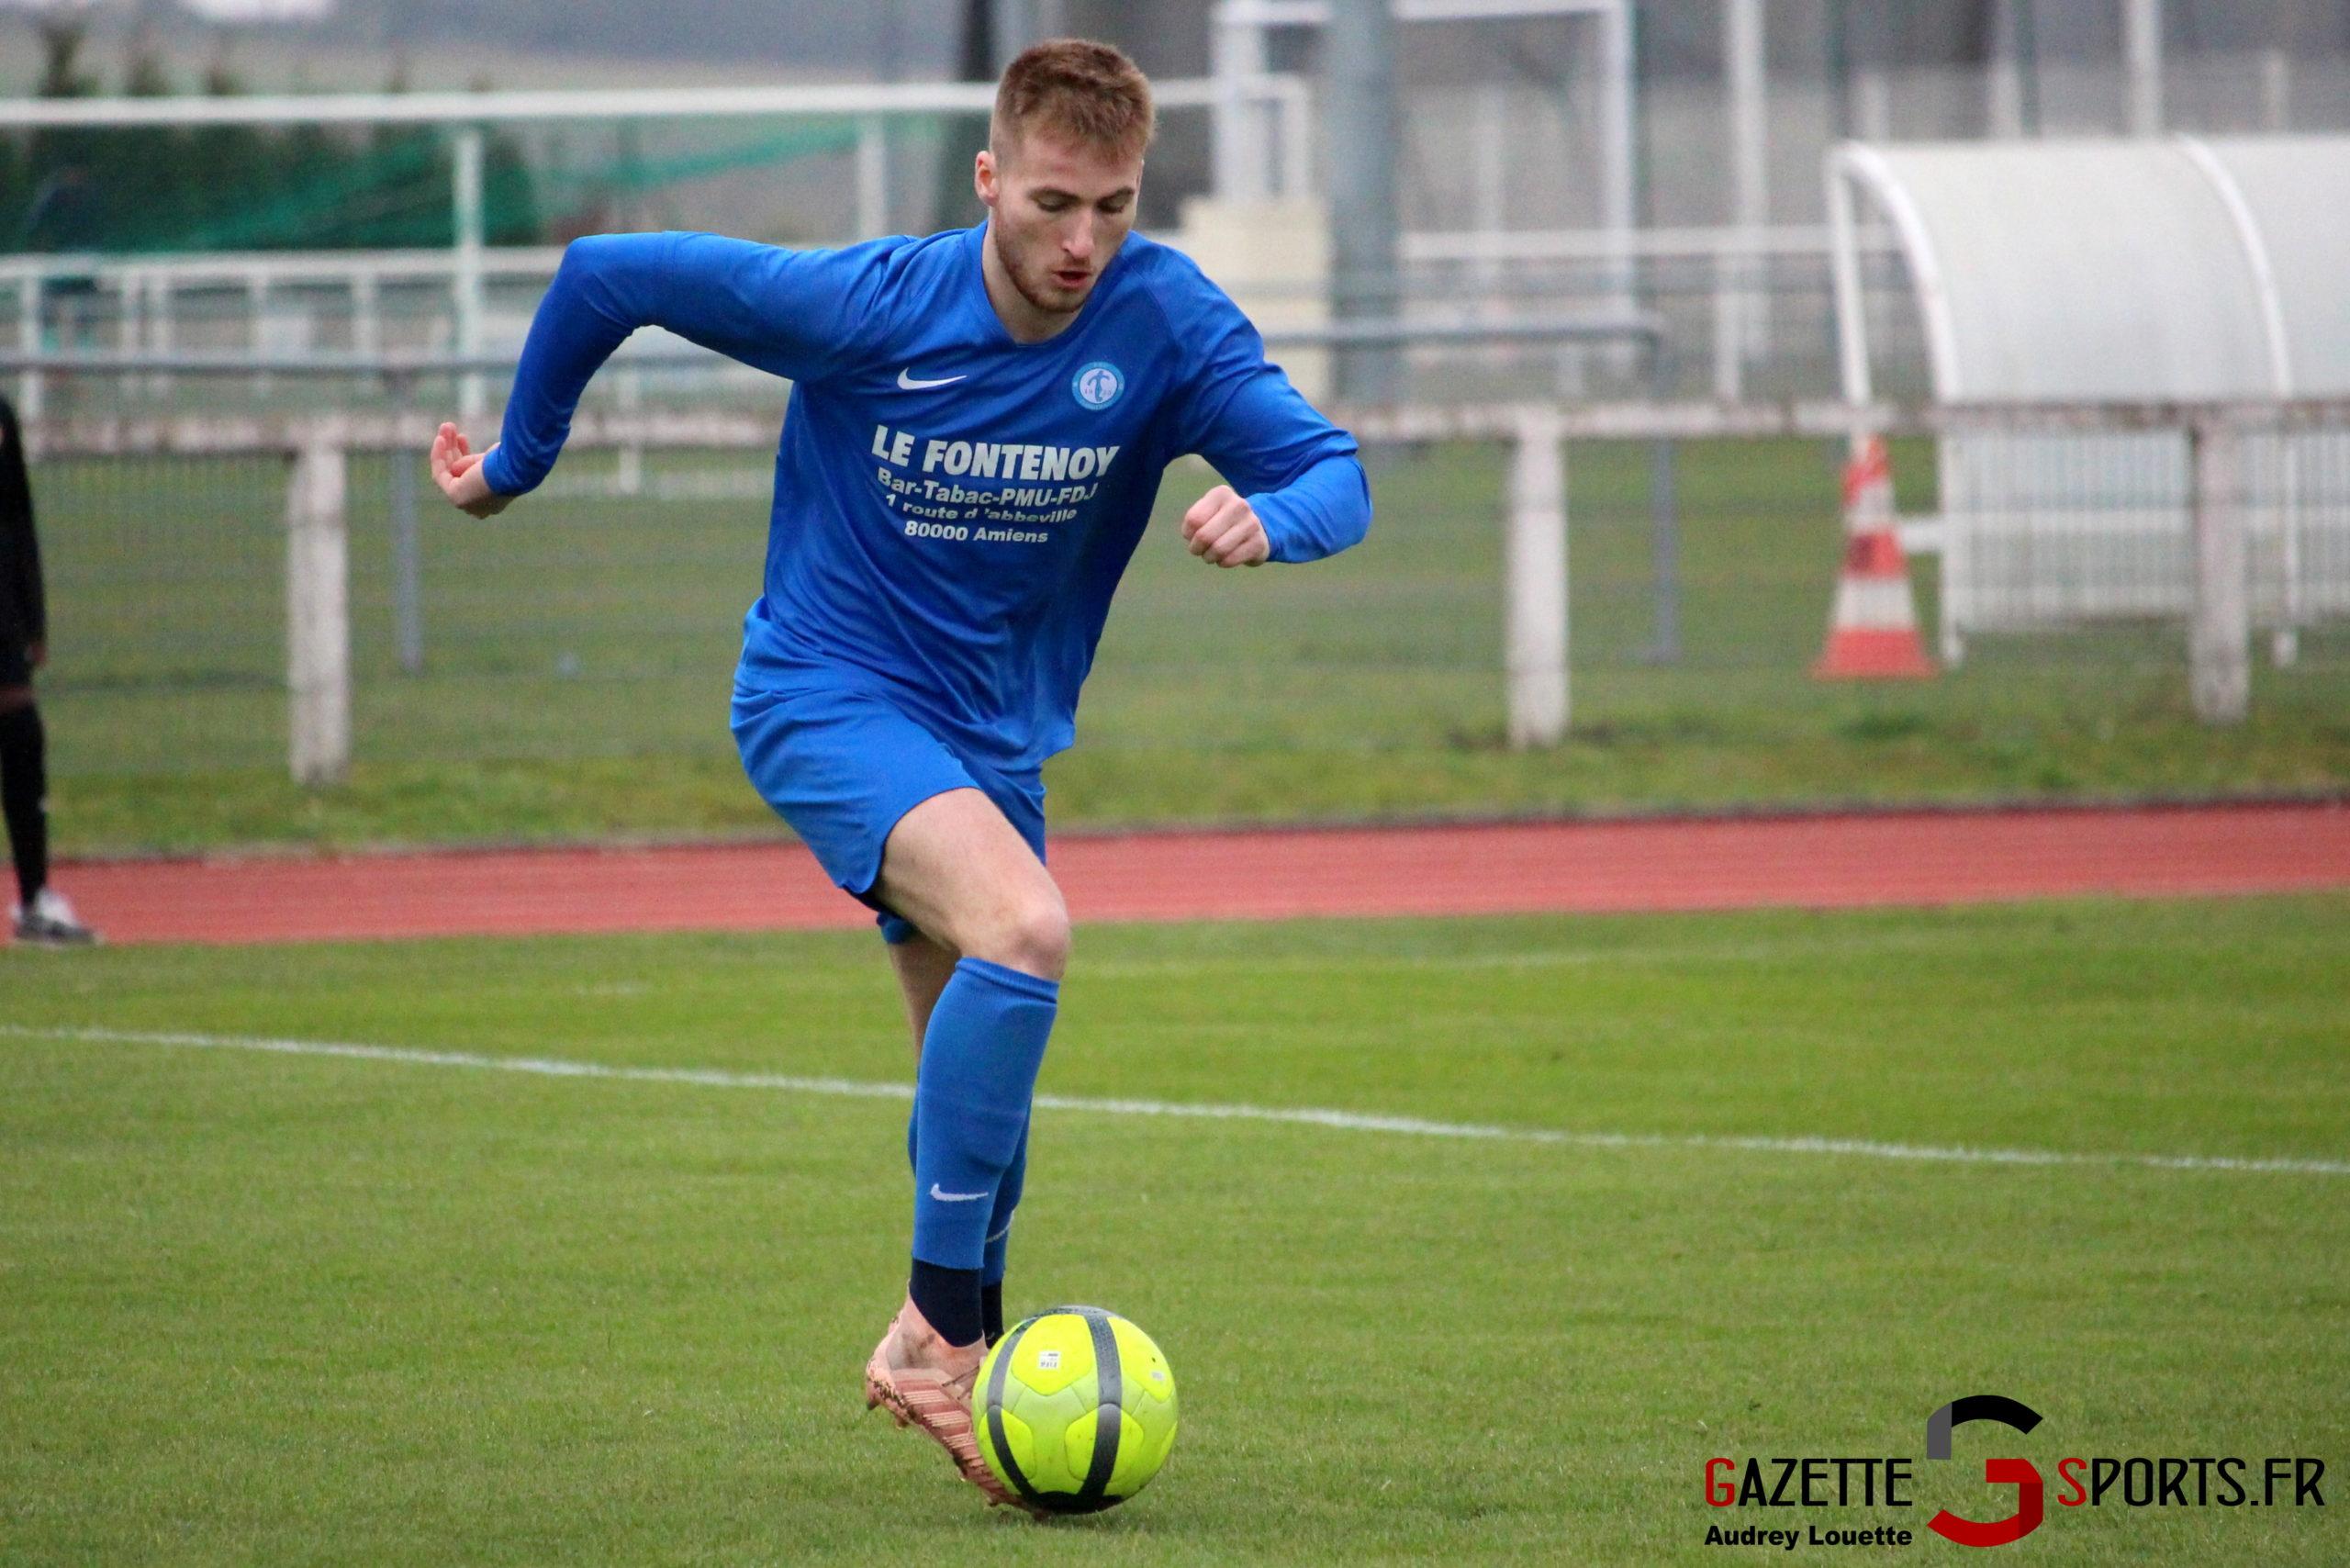 Football Camon Vs Longueau Audrey Louette Gazettesports (15)